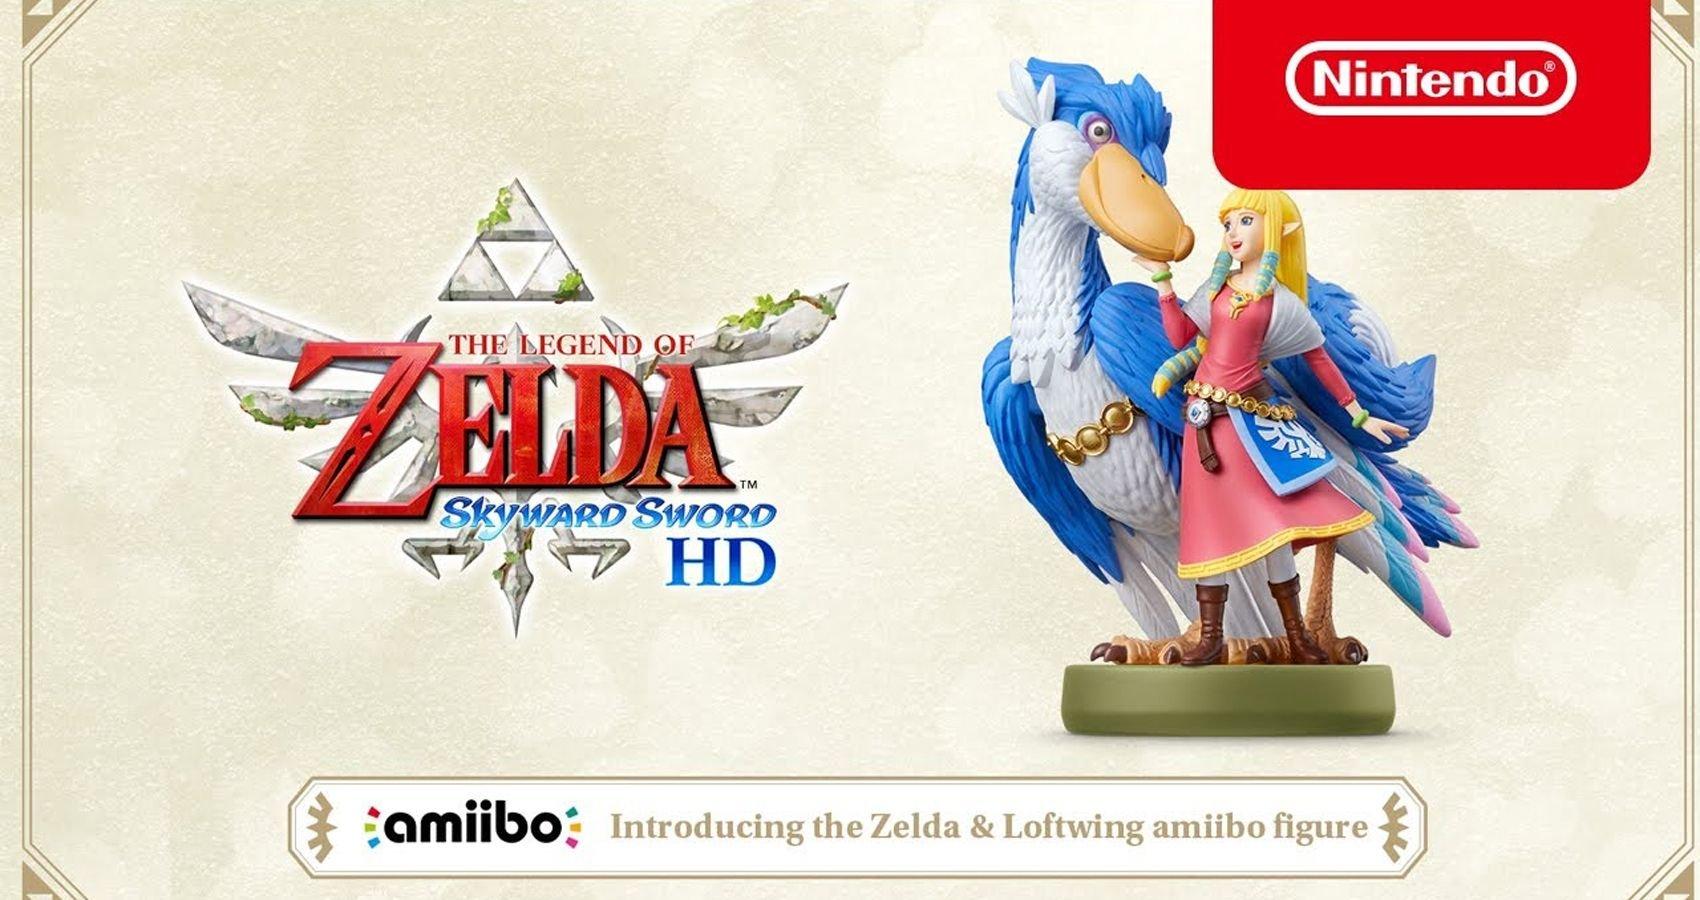 Zelda & Loftwing Amiibo Announced For Legend Of Zelda: Skyward Sword HD